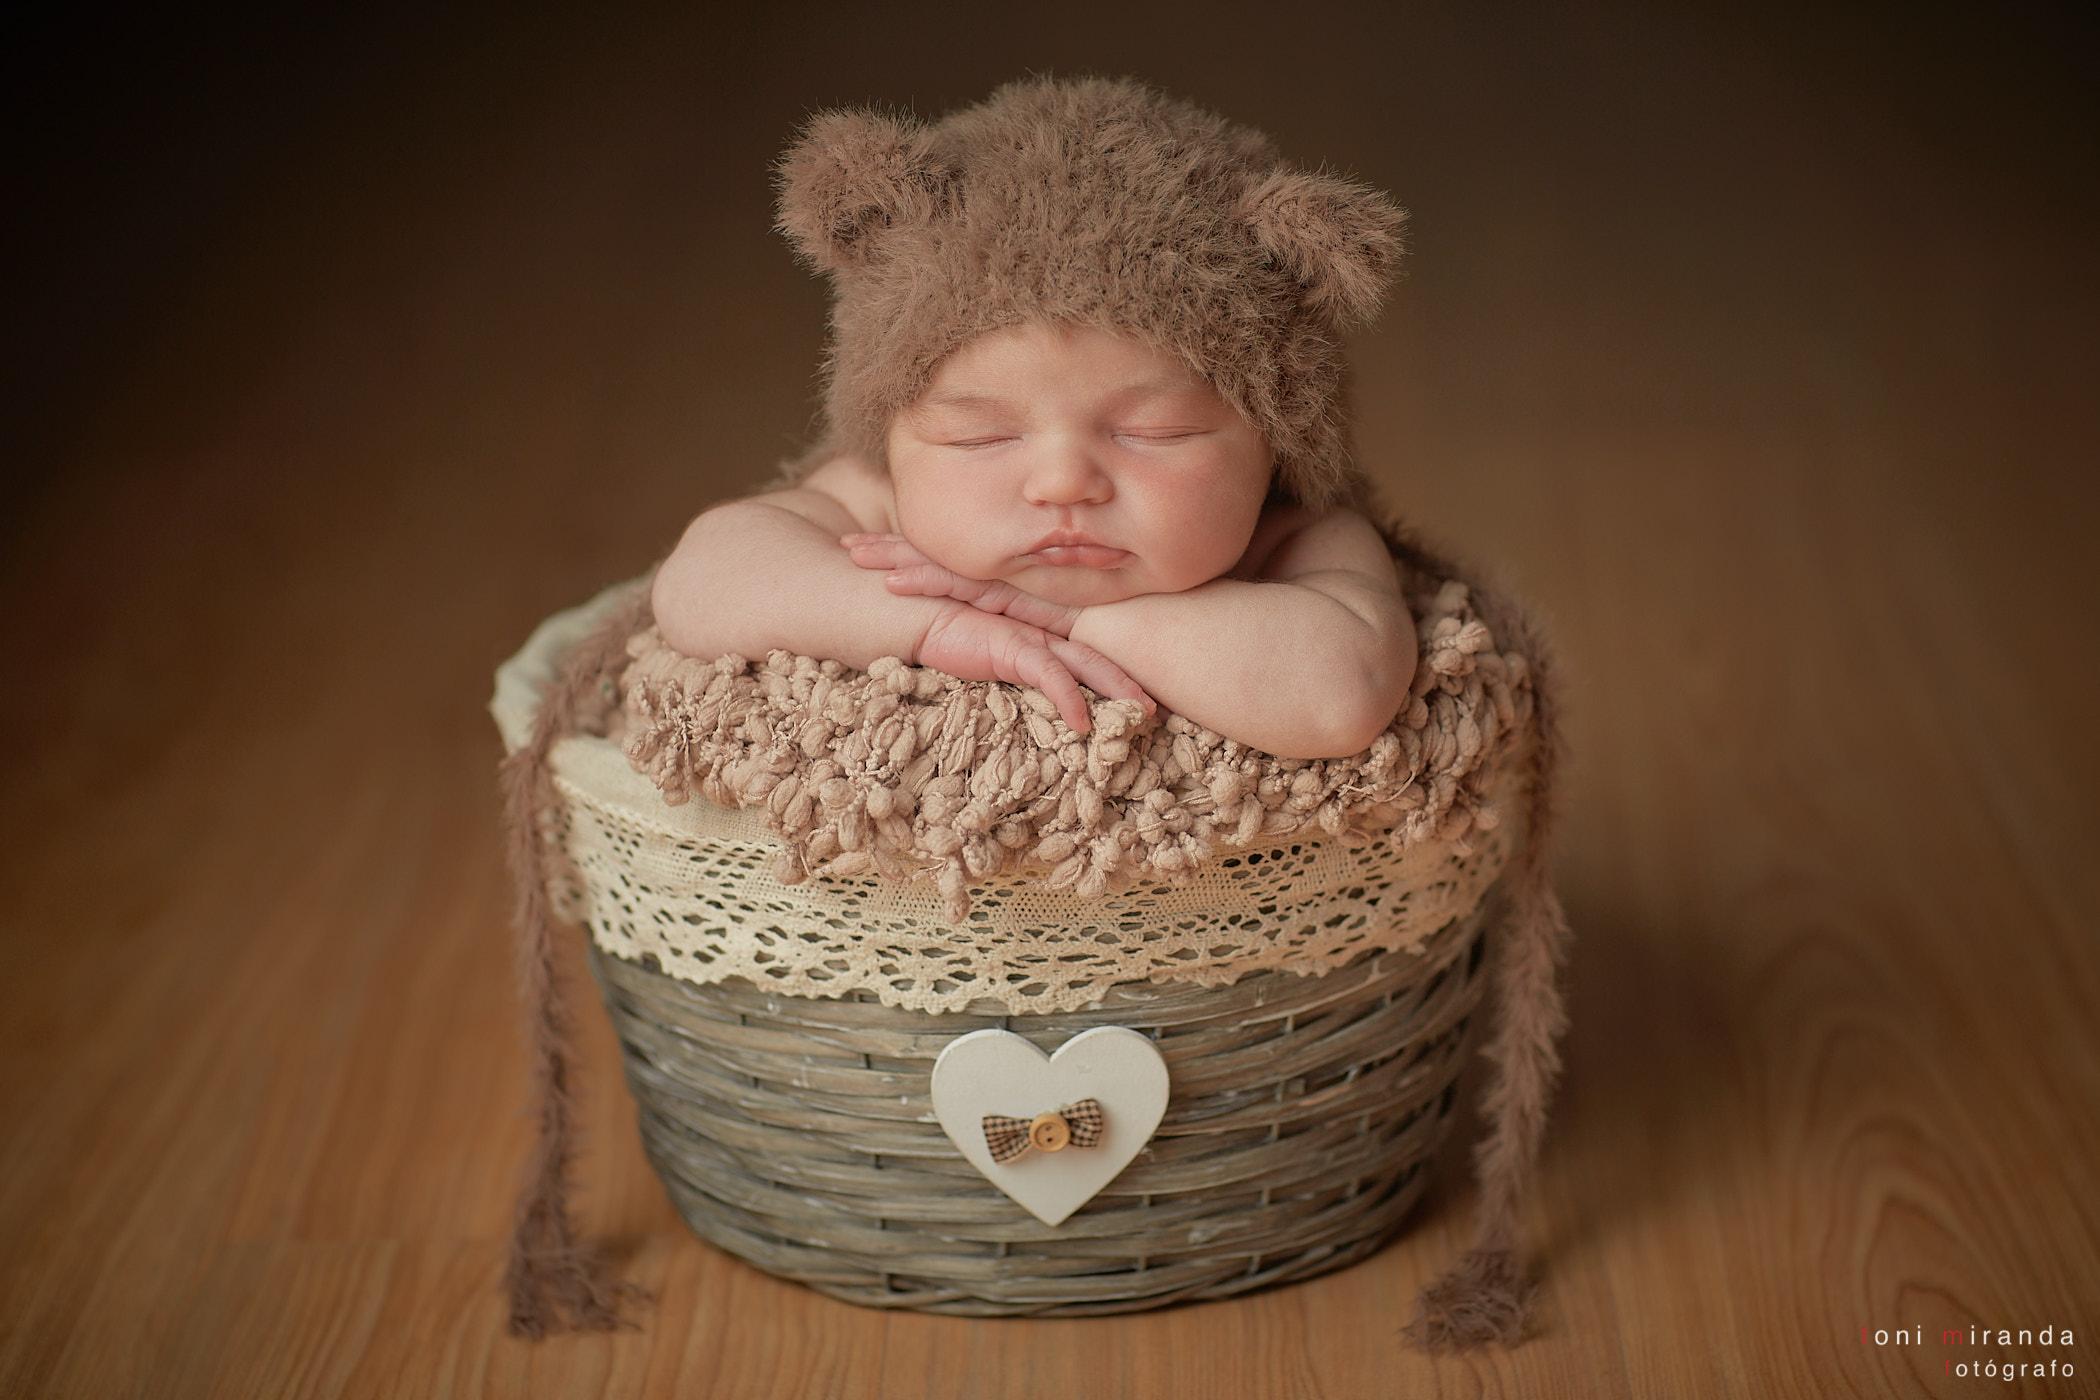 bebe durmiendo dentro de cestita con gorro lana